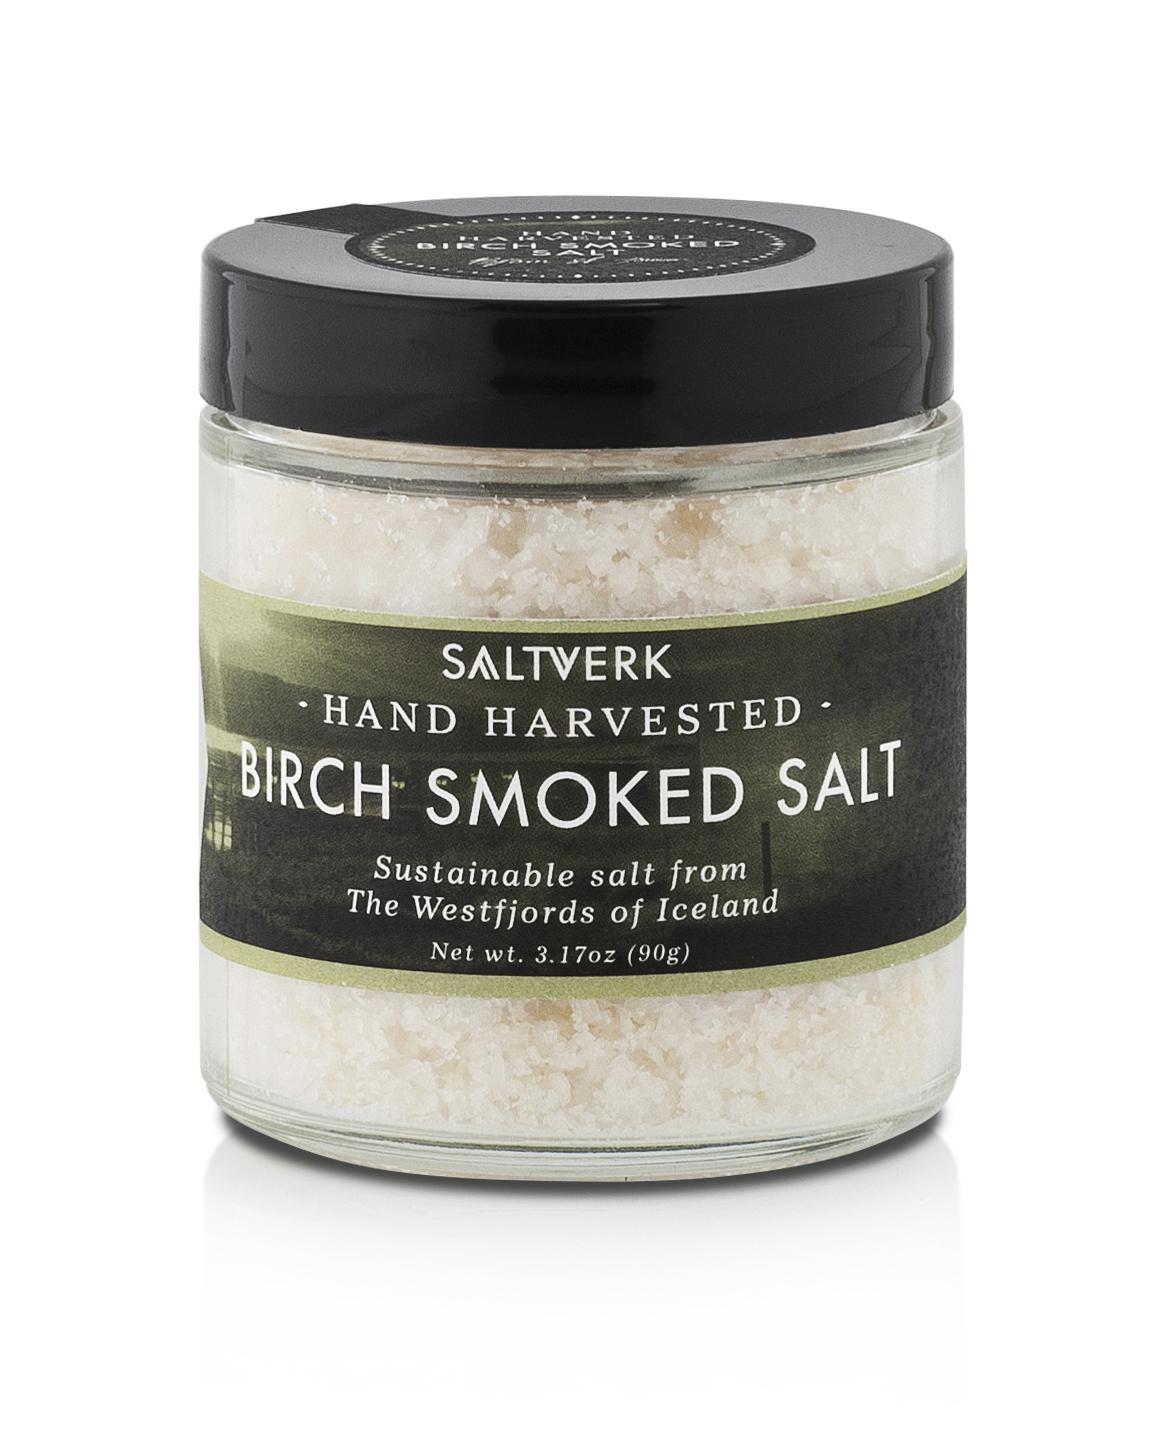 Birch Smoked Salt - $13